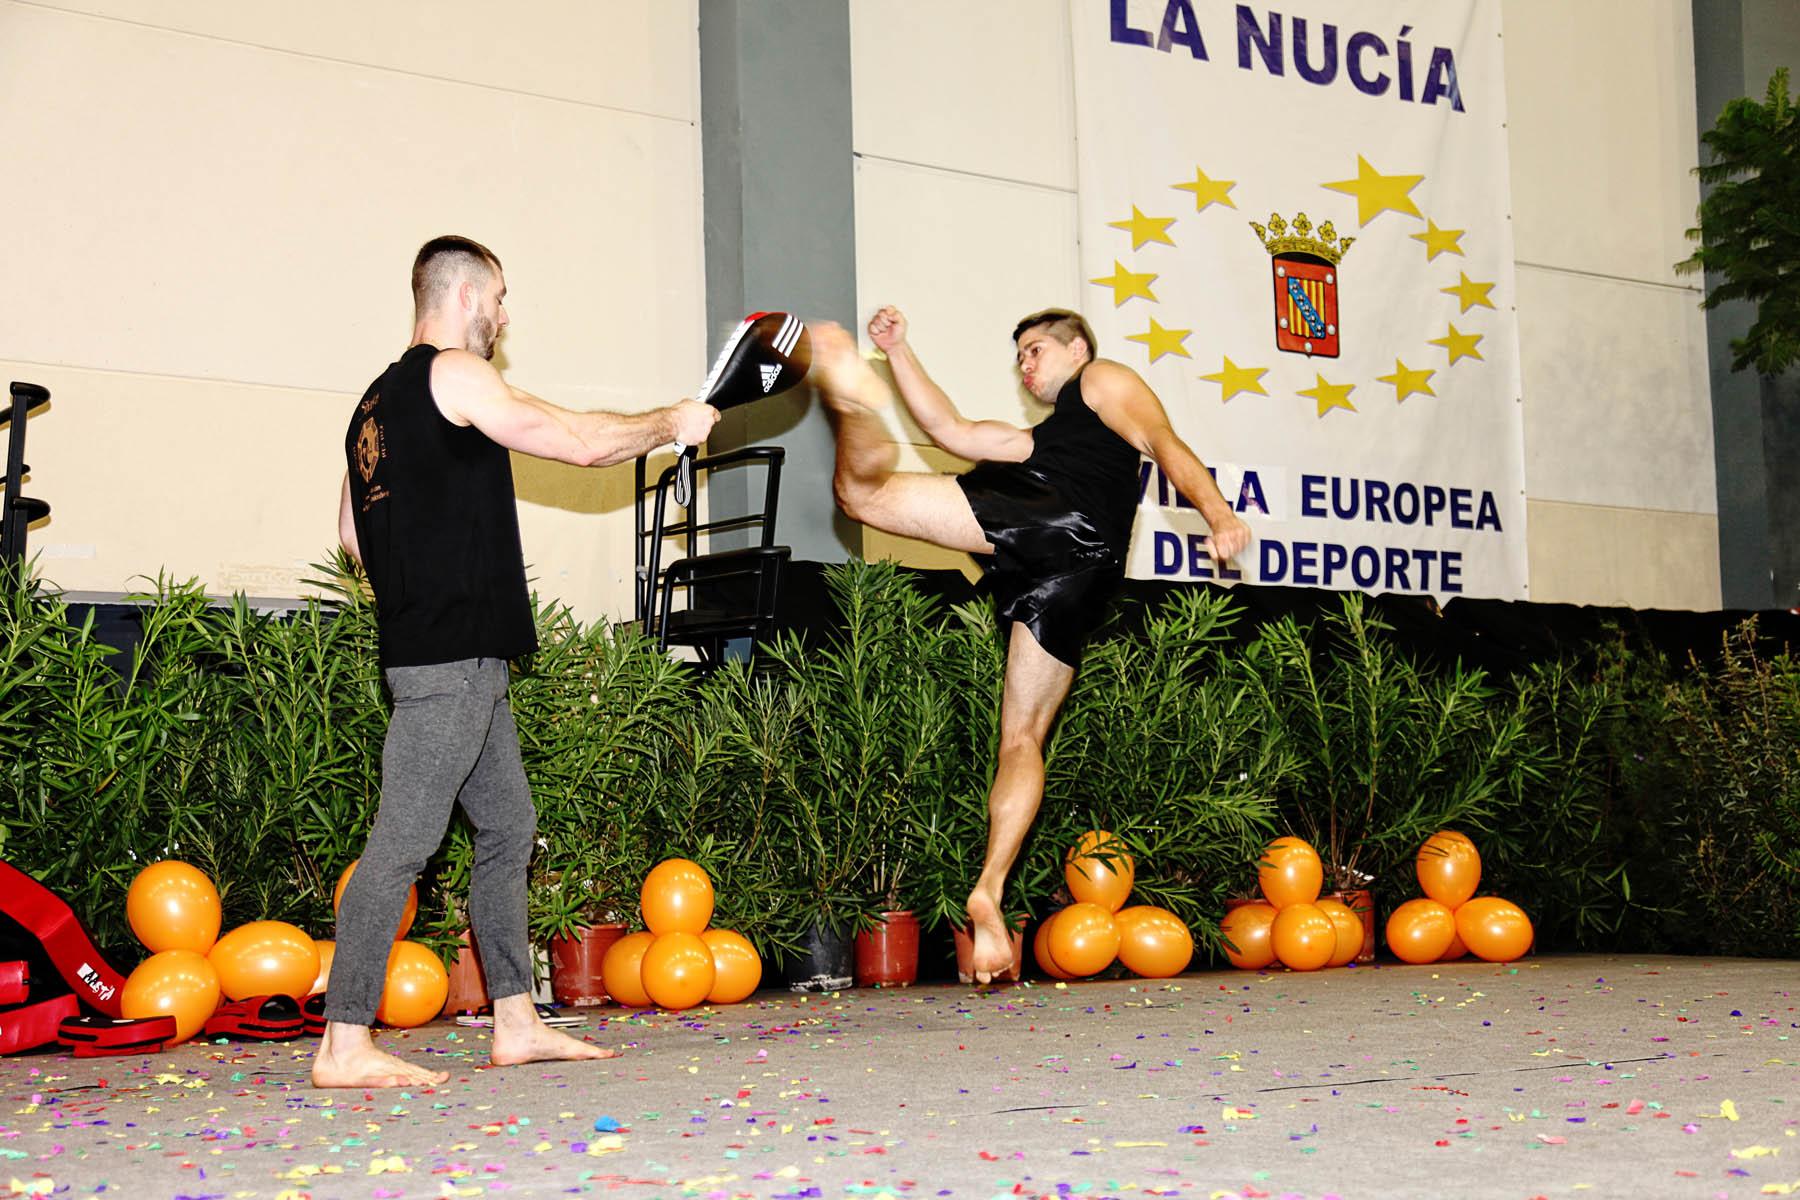 shakti yoga masage martial arts dance thai restaurant albir benidorm altea lanucia calpe alfas 13